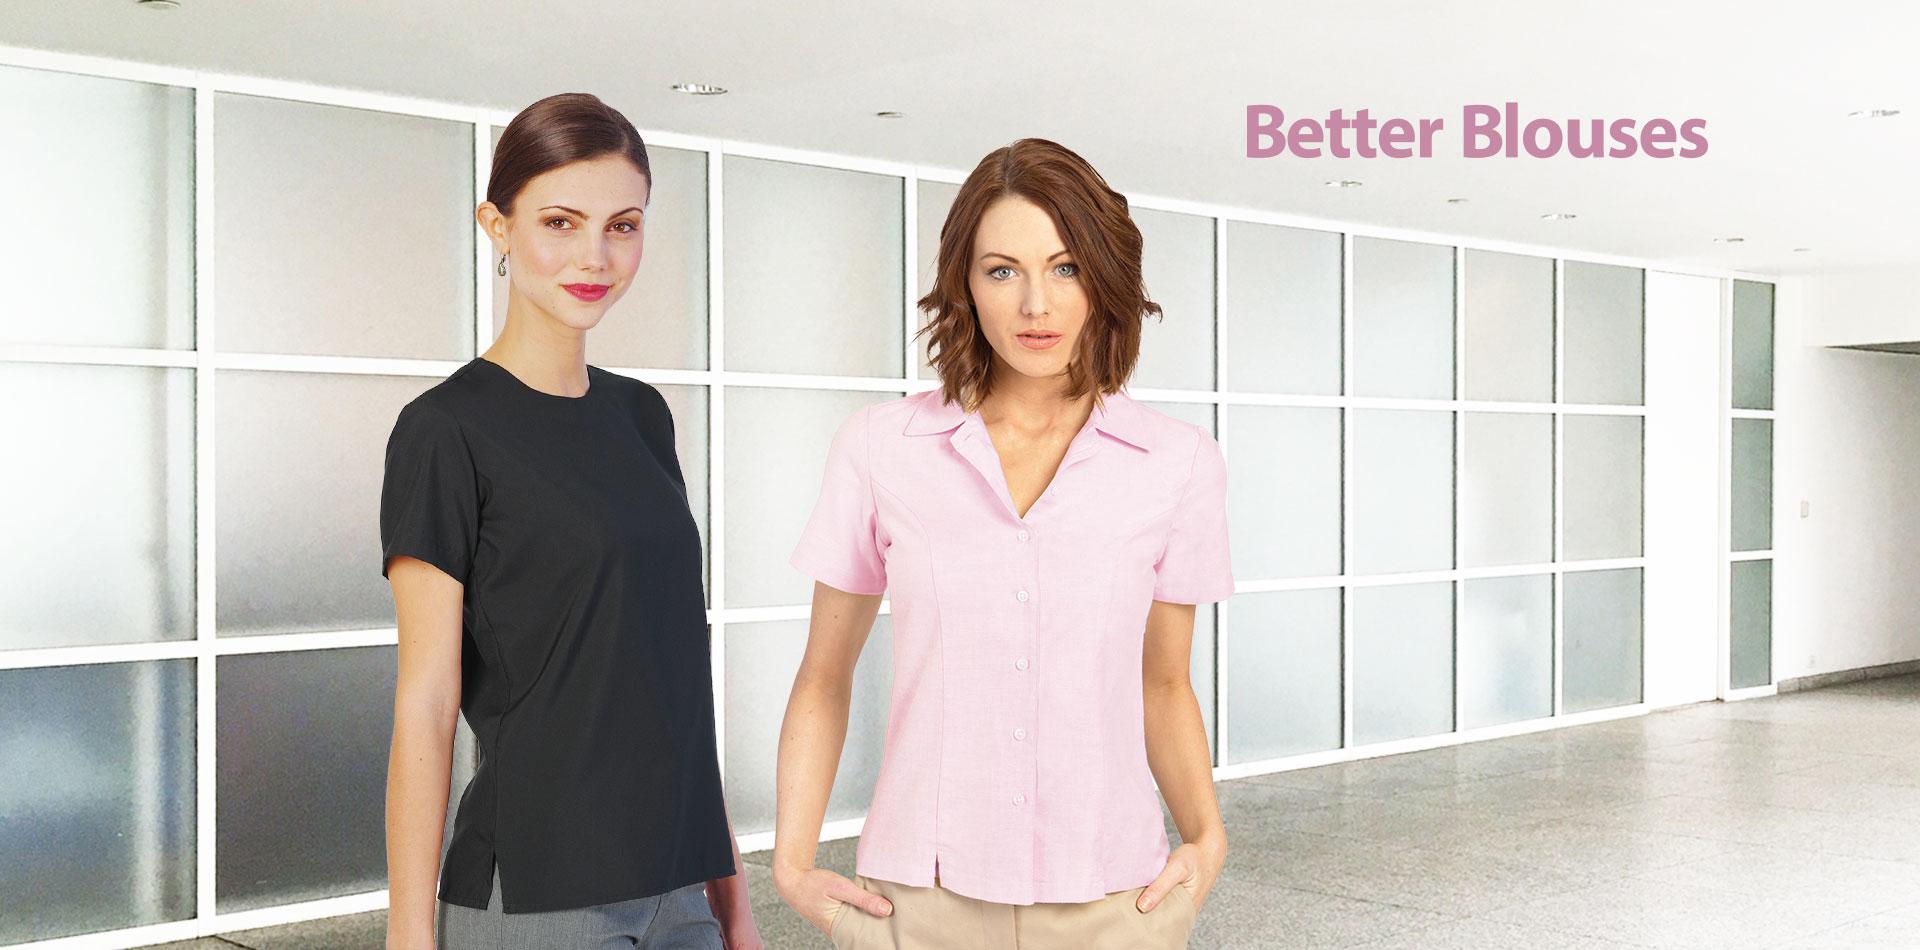 Executive Apparel Better Blouses for Uniforms